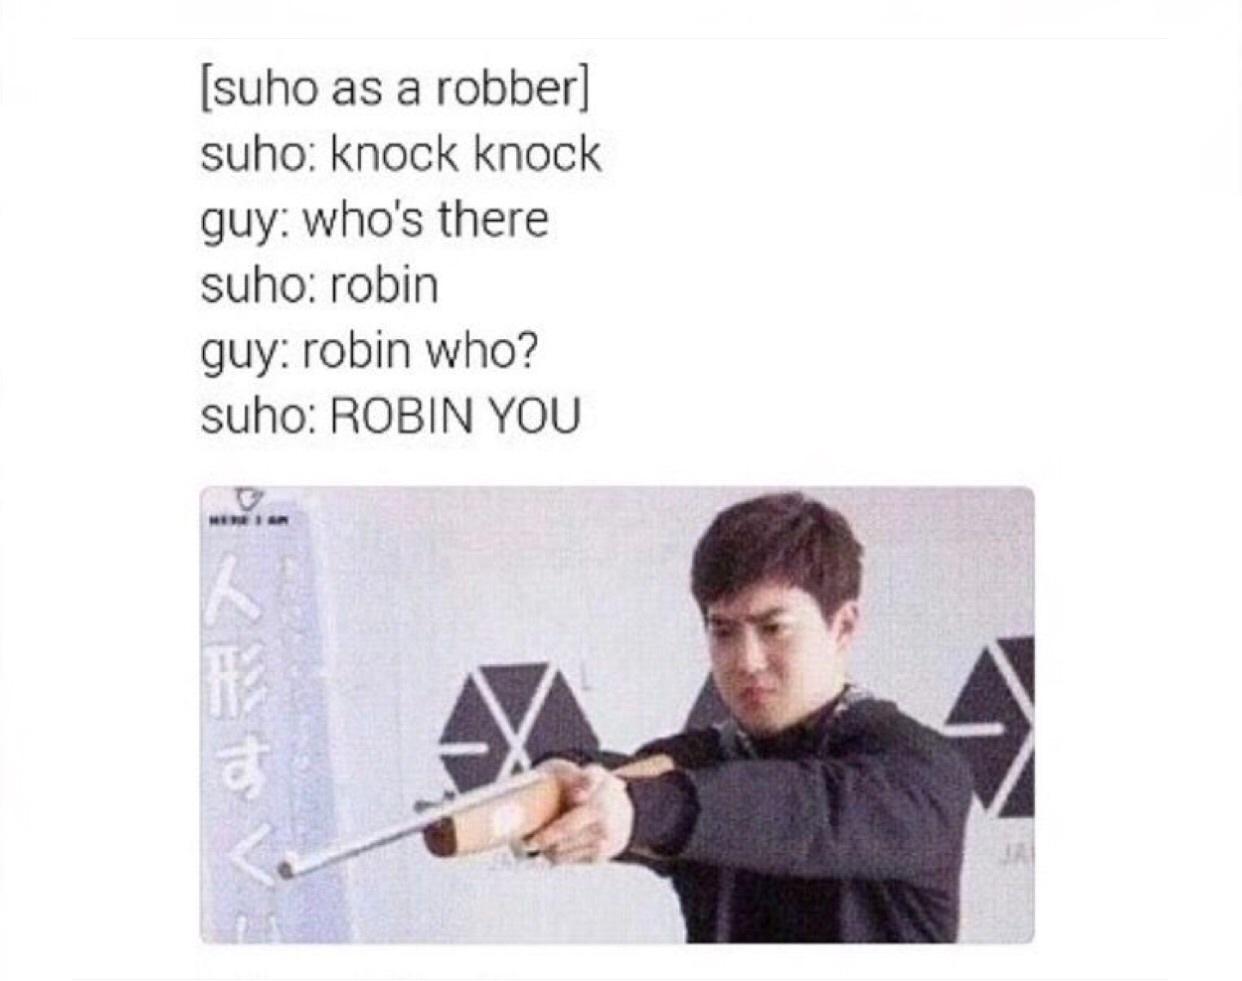 exo, jocke, and funny image